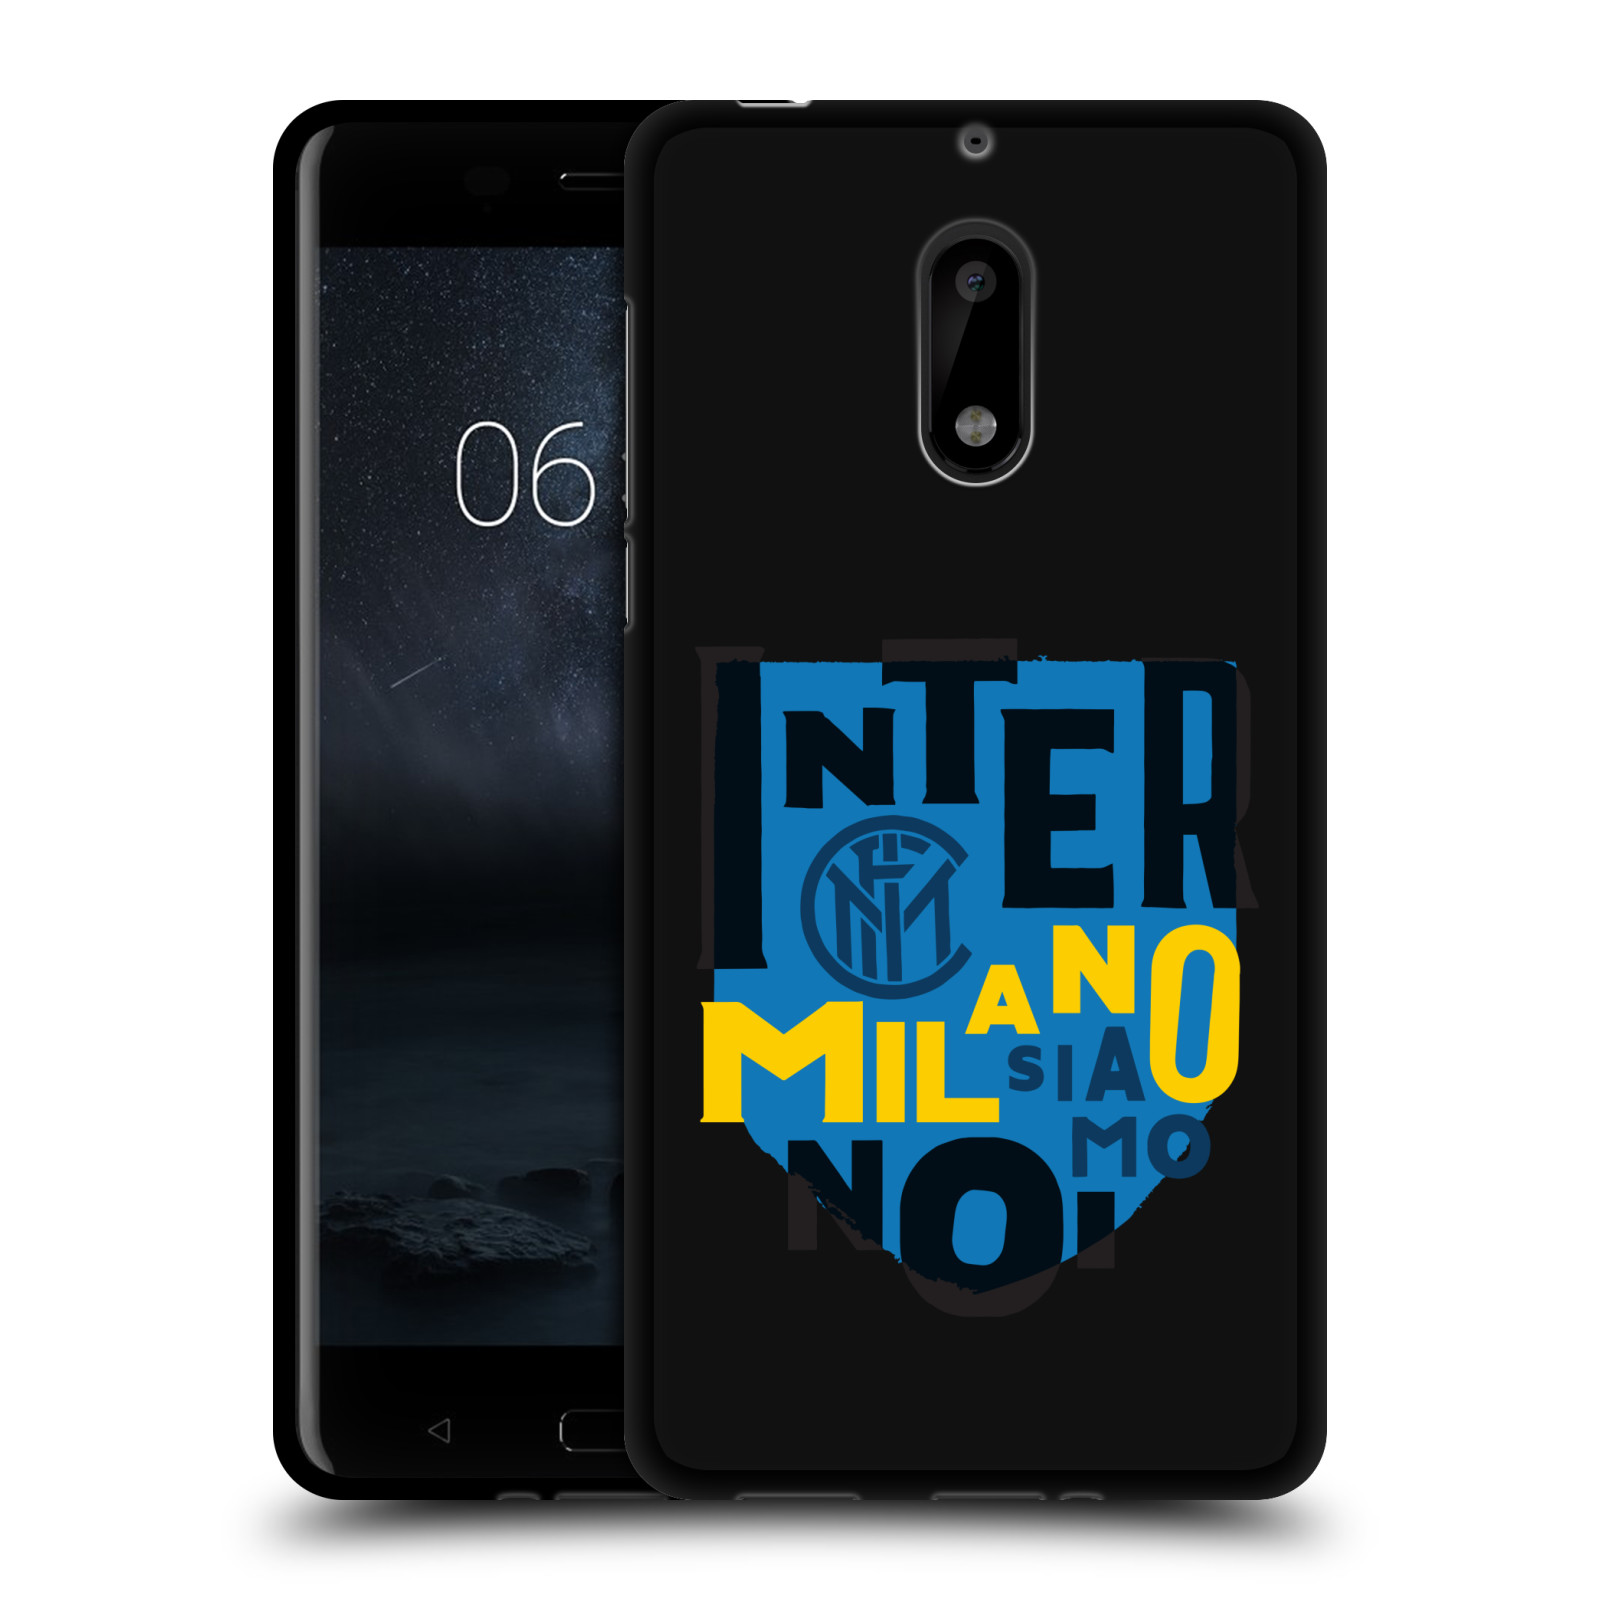 OFFICIAL-INTER-MILAN-2017-18-GRUNGE-BLACK-GEL-CASE-FOR-MICROSOFT-NOKIA-PHONES